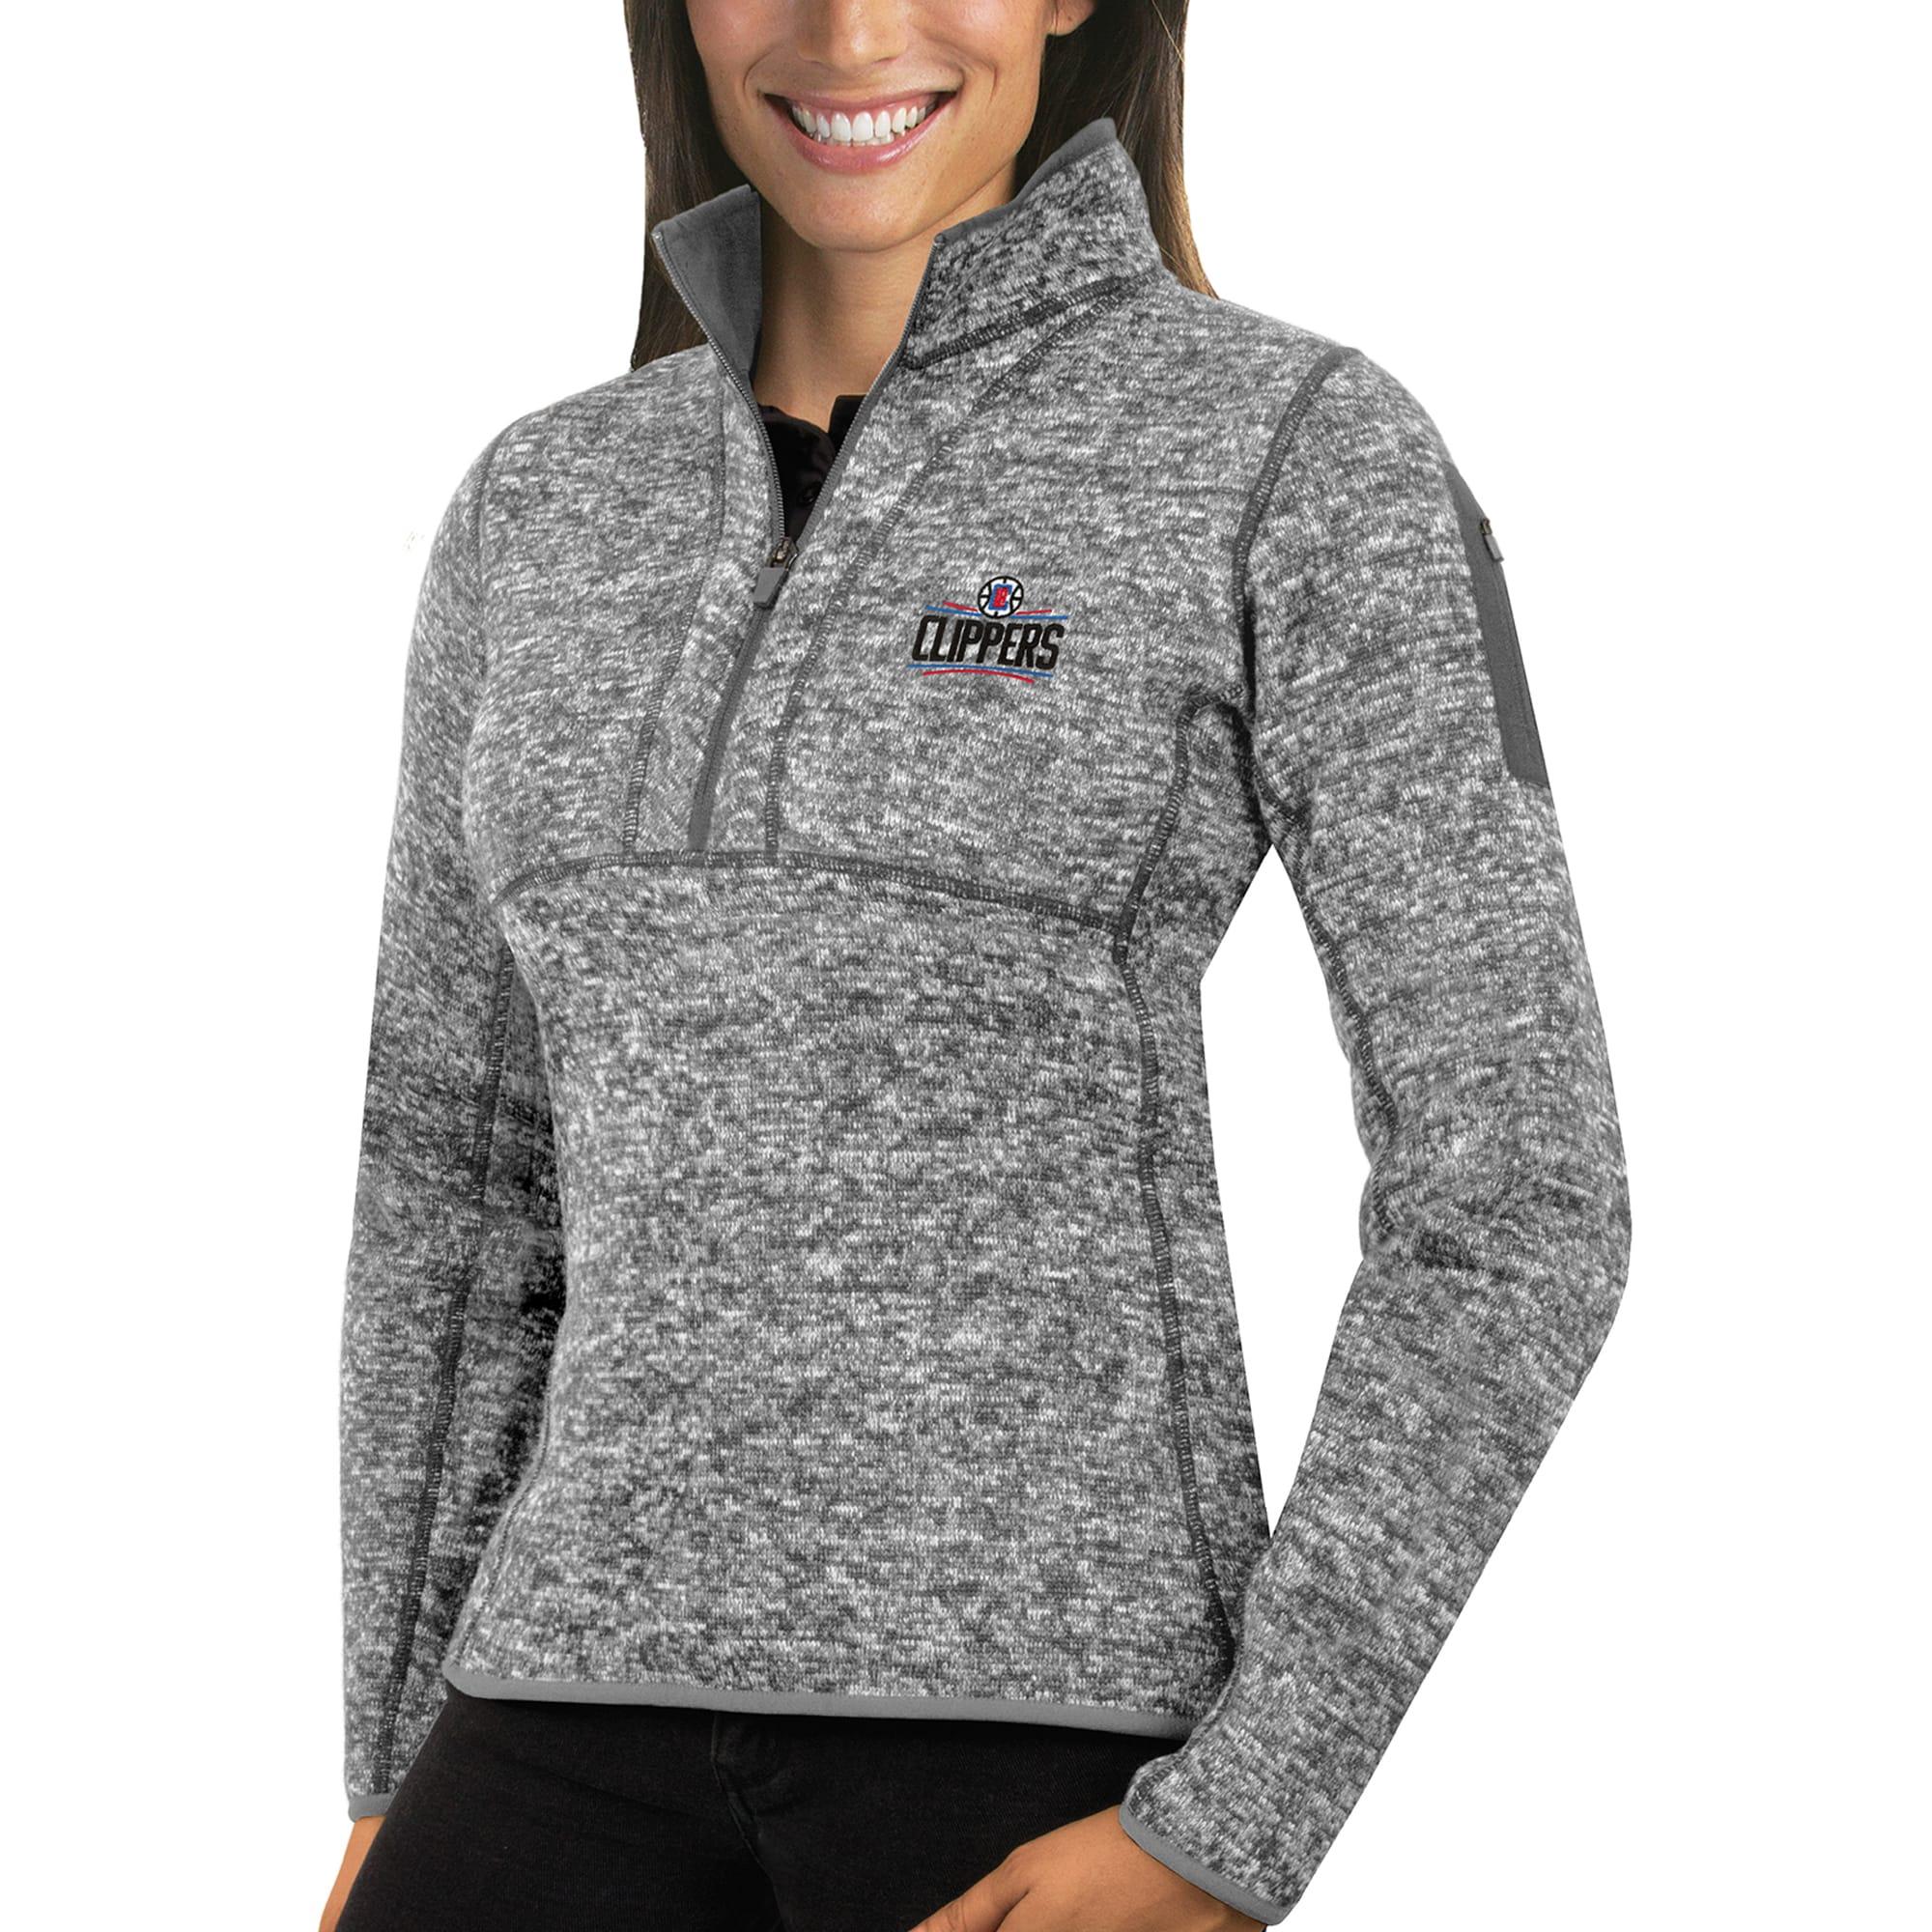 LA Clippers Antigua Women's Fortune Half-Zip Pullover Jacket - Heather Gray